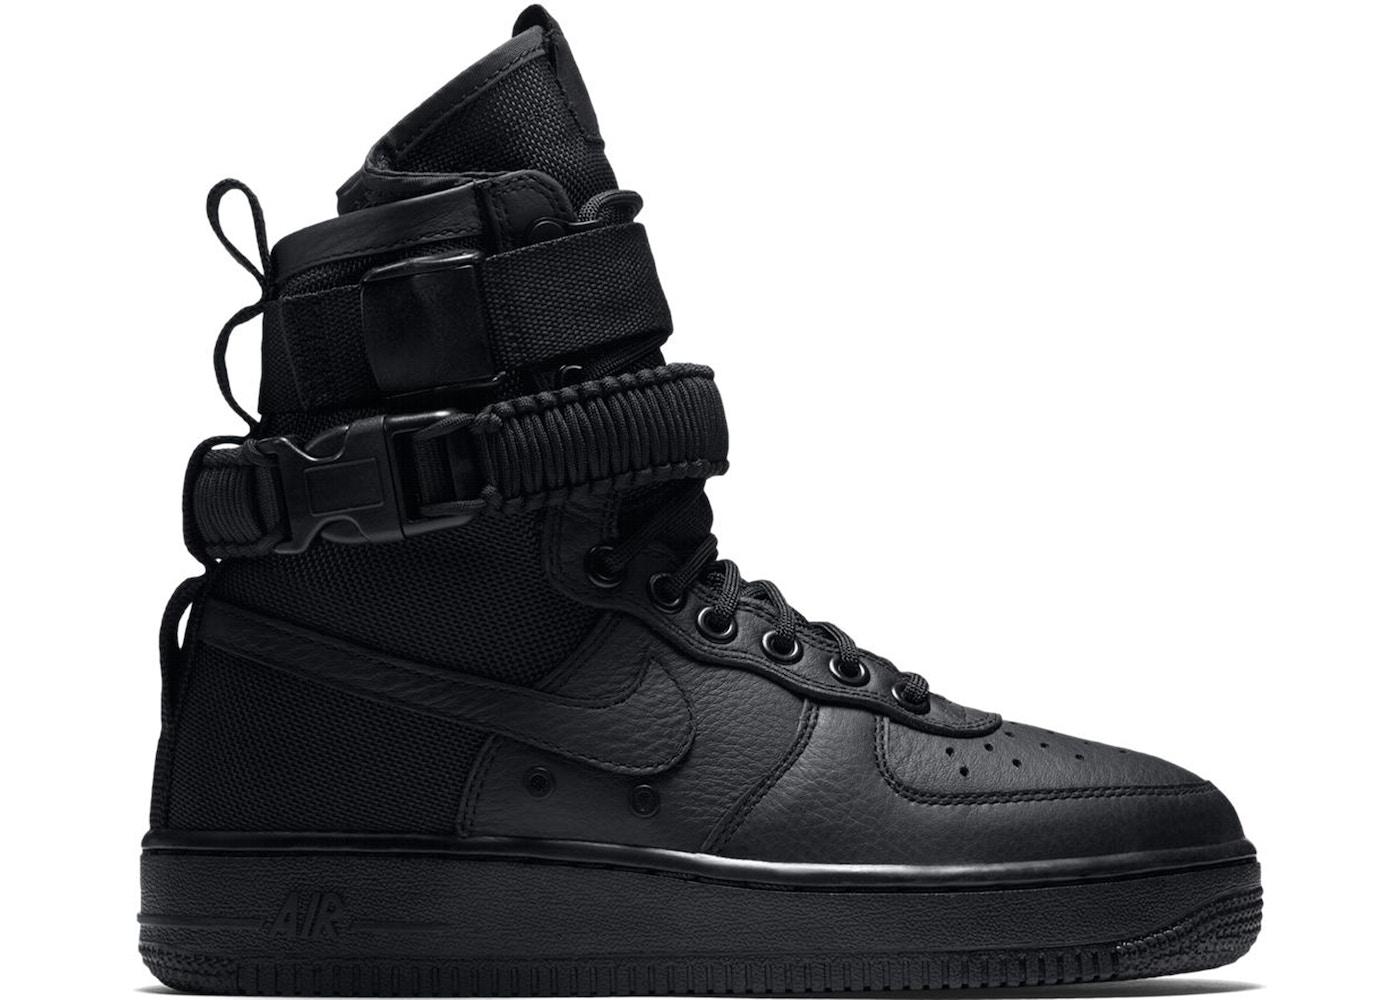 Nike SF Air Force 1 Black